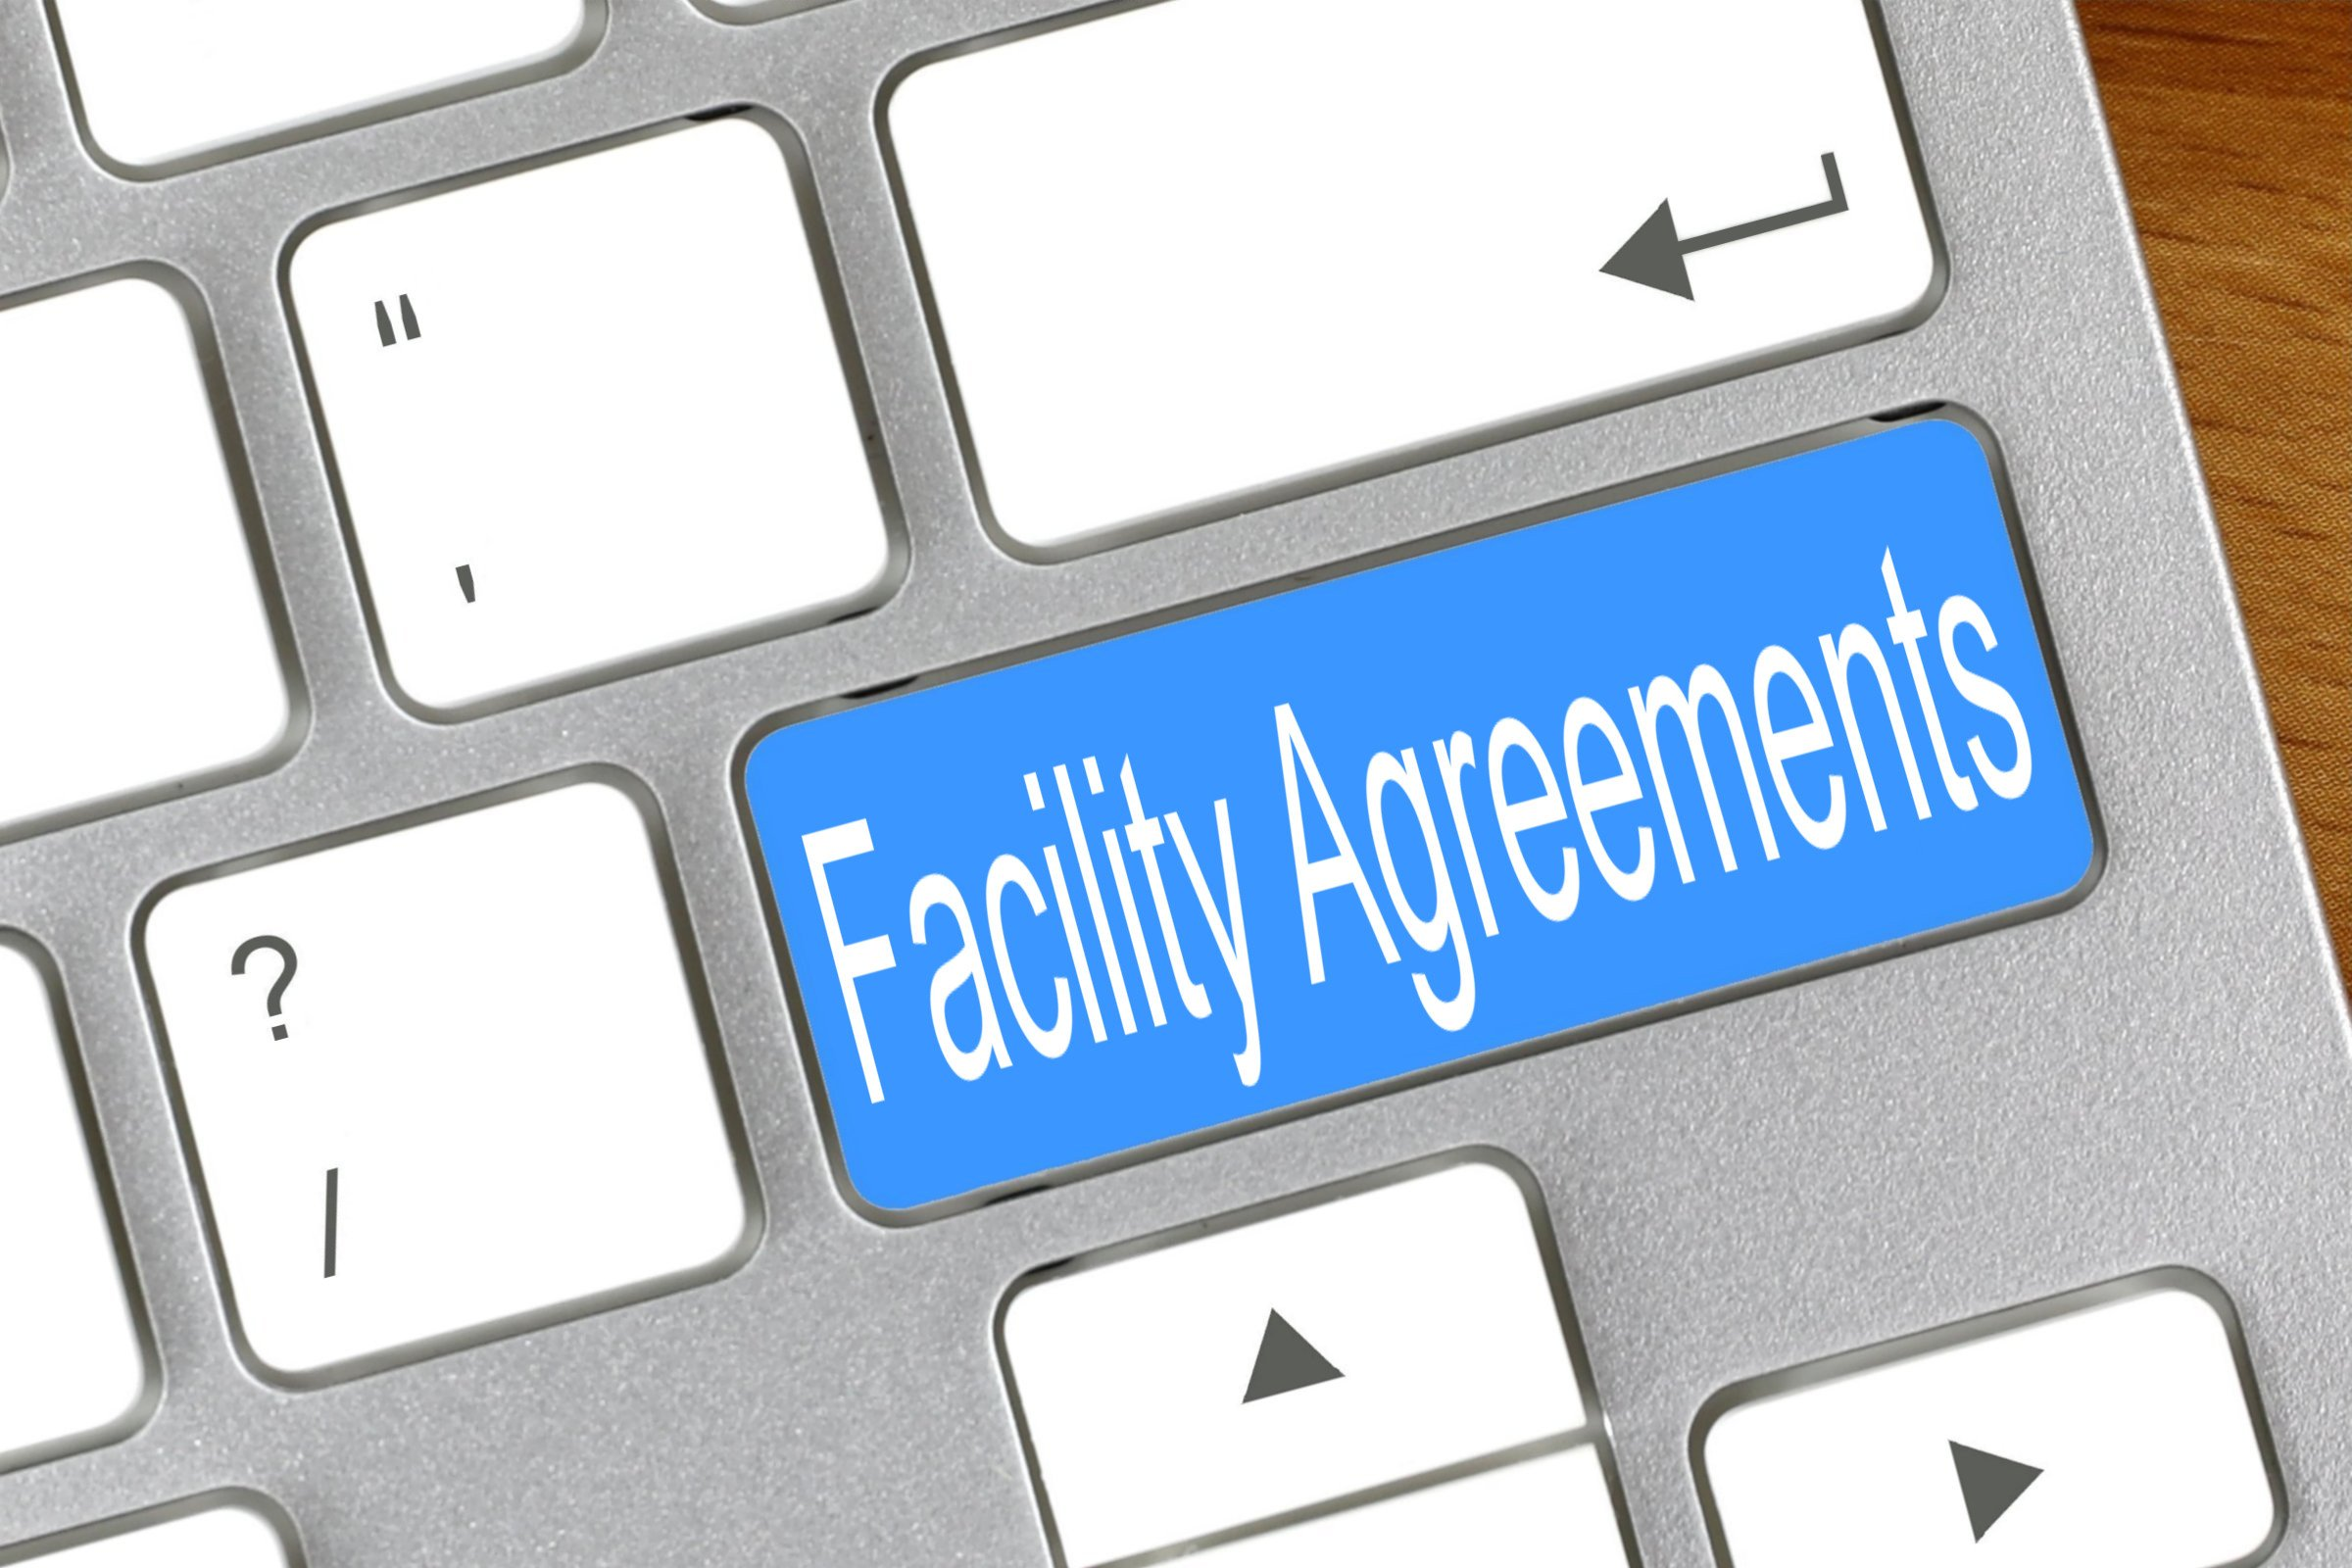 Facility Agreements